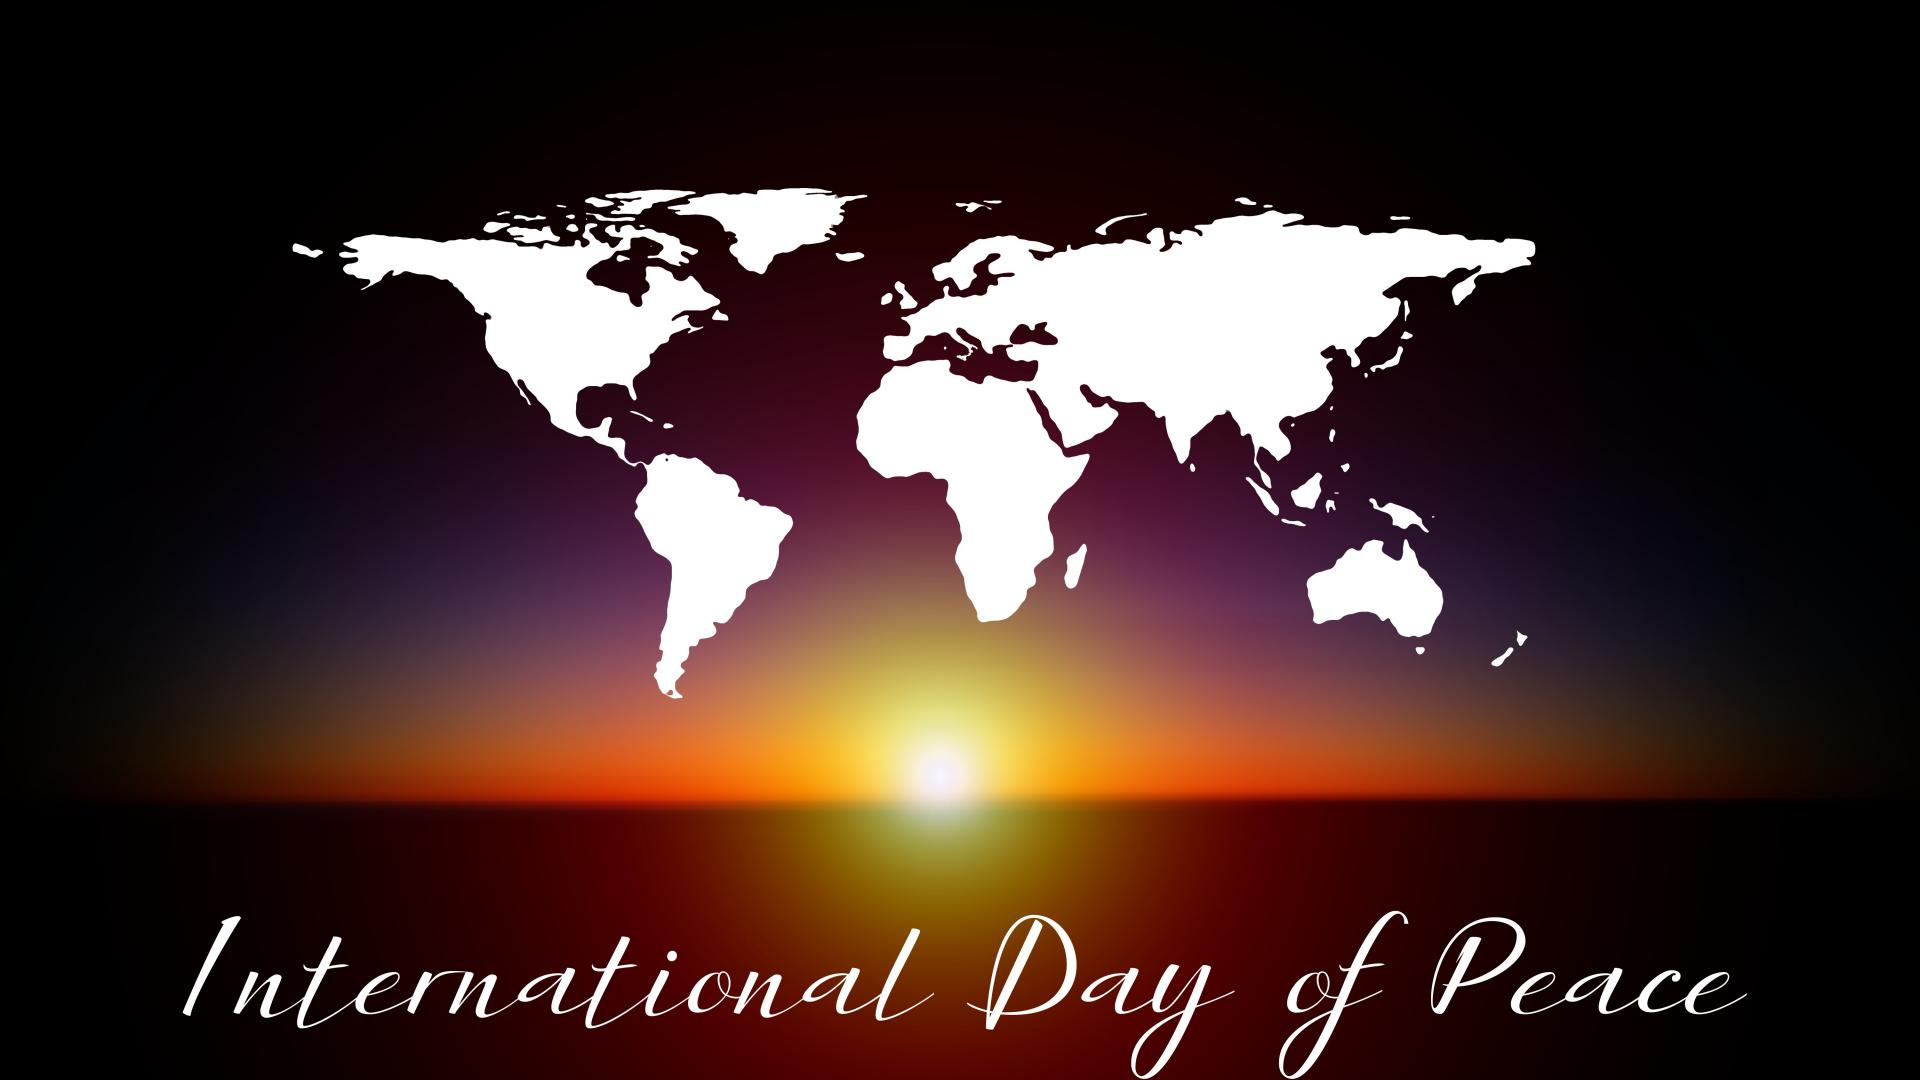 International Day of Peace Wallpaper 11   6000 X 4000 stmednet 1920x1080